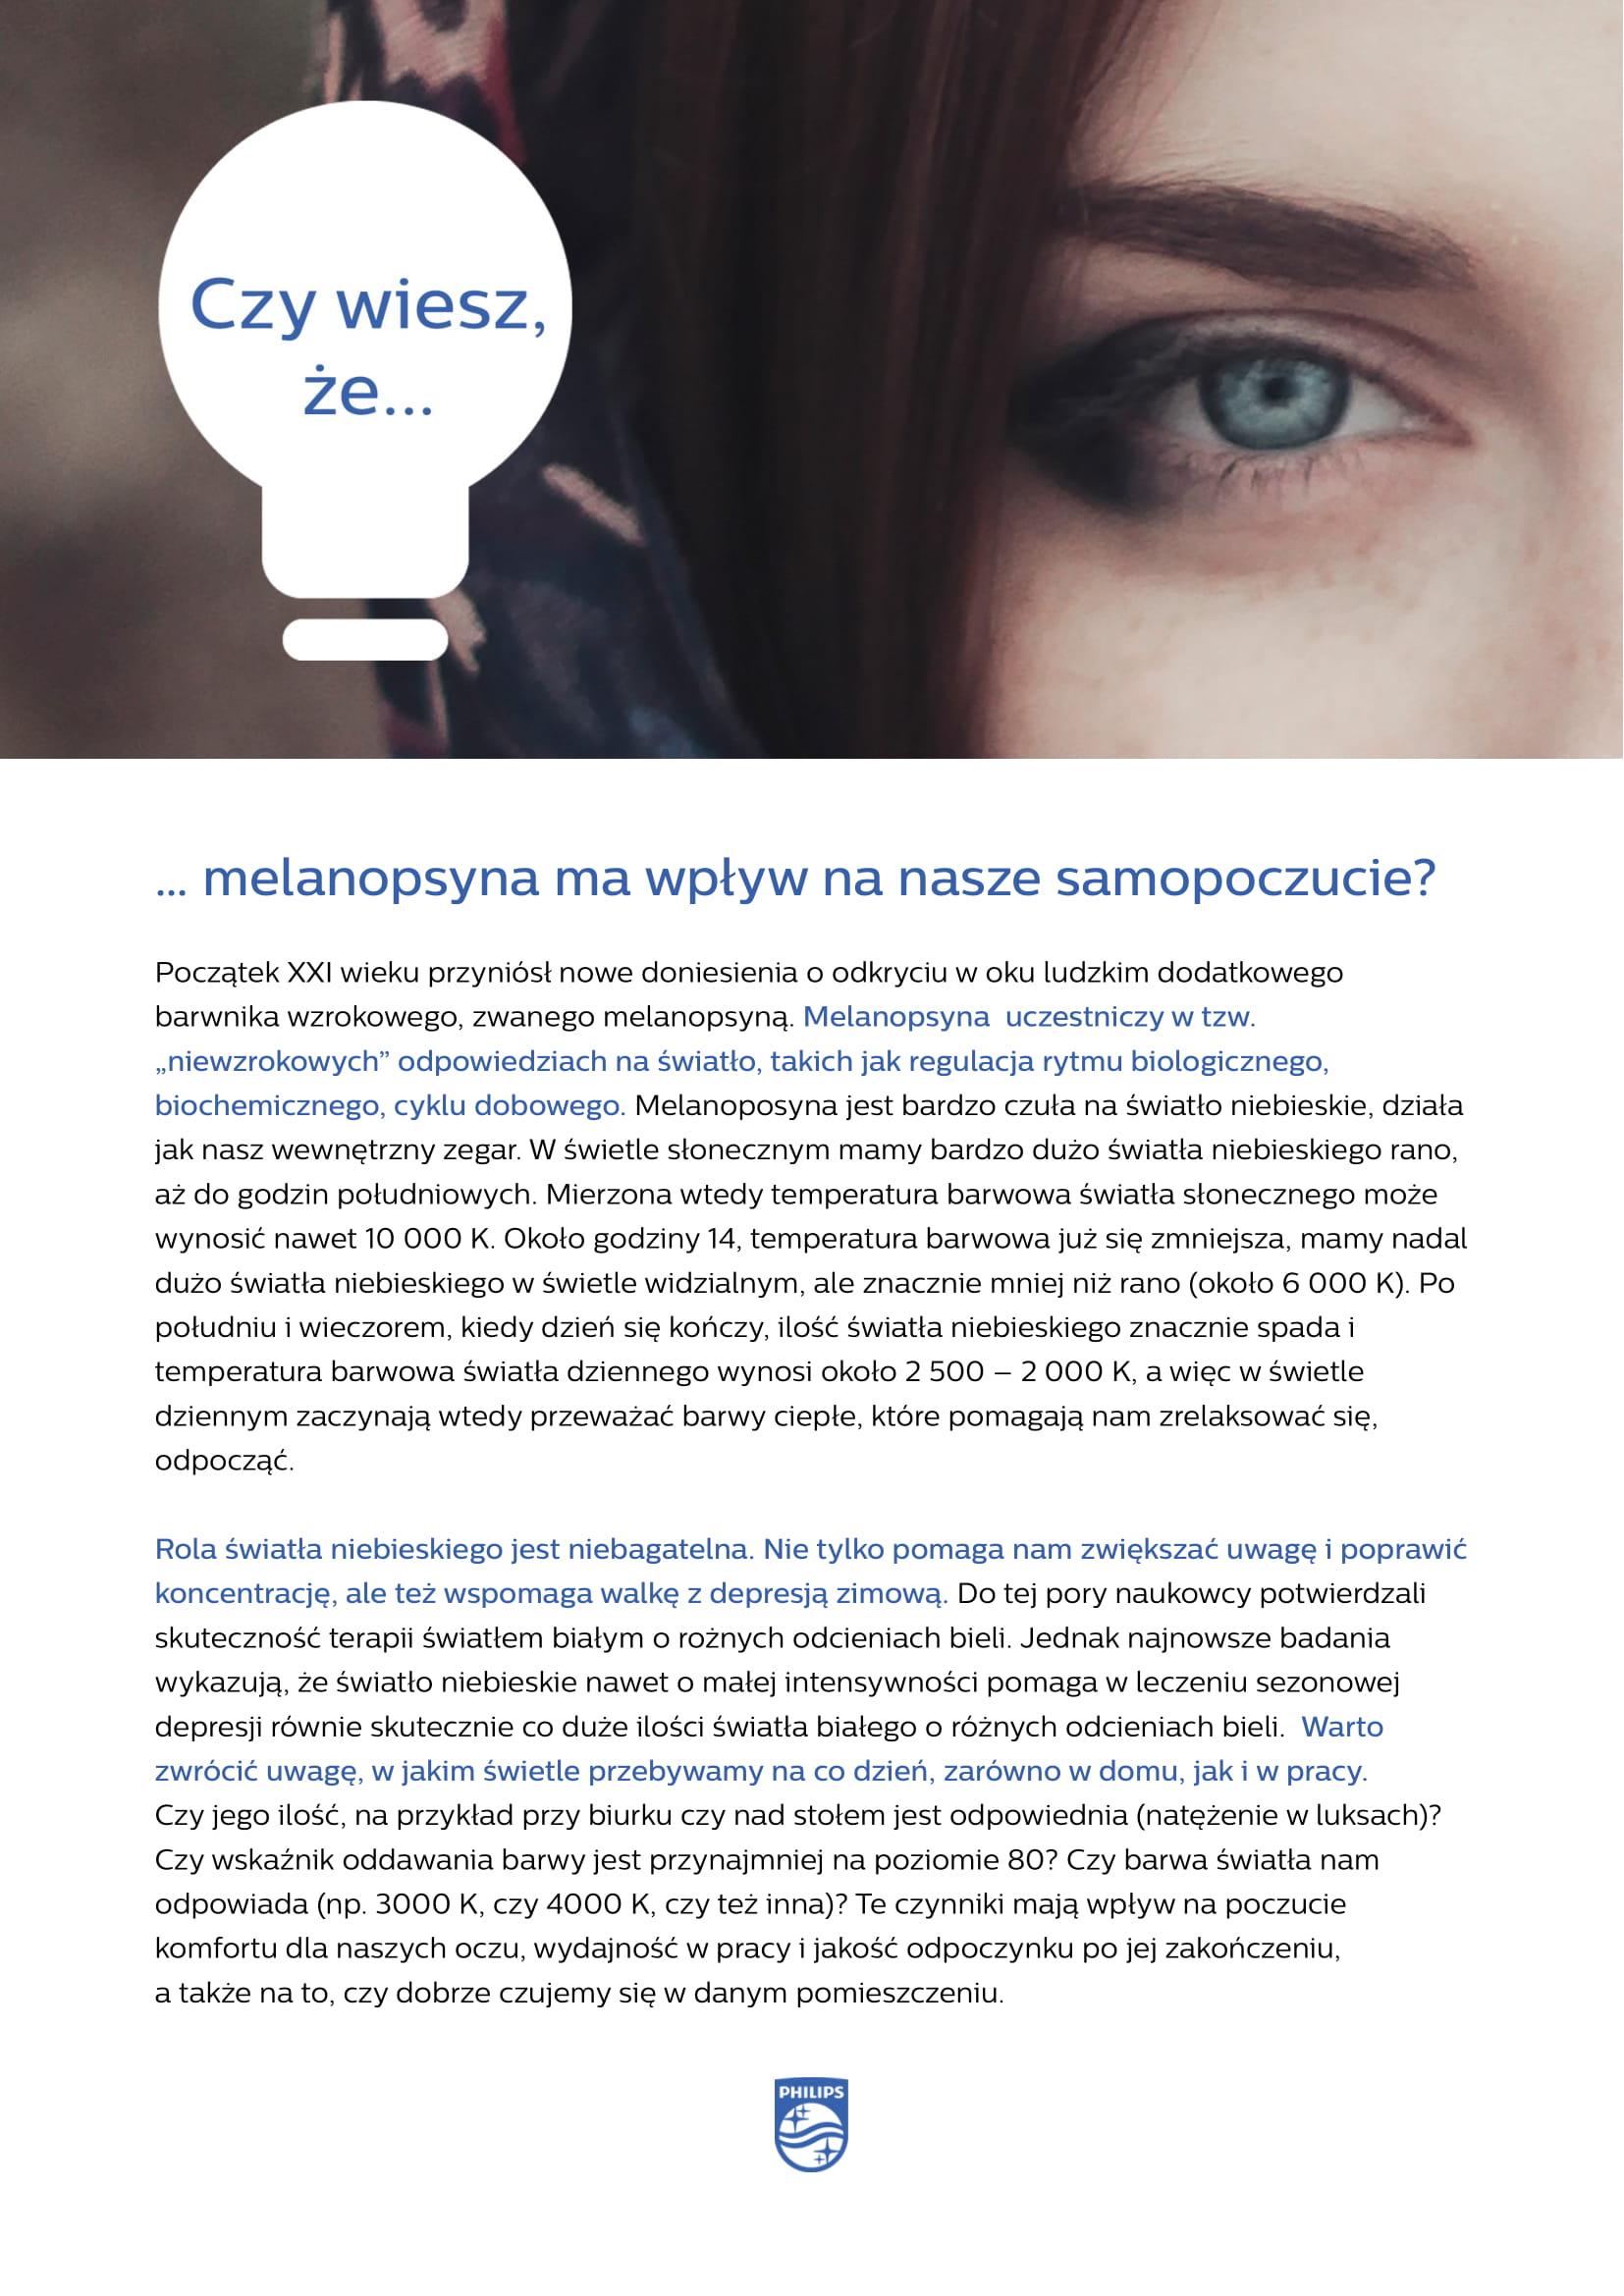 Melanopsyna-1